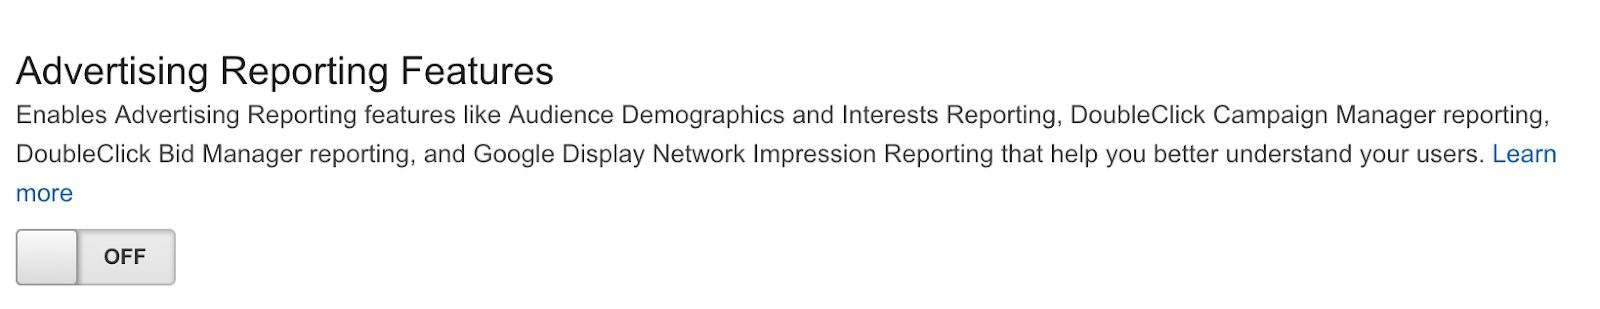 Enabling Advertising Report Features in Google Analytics